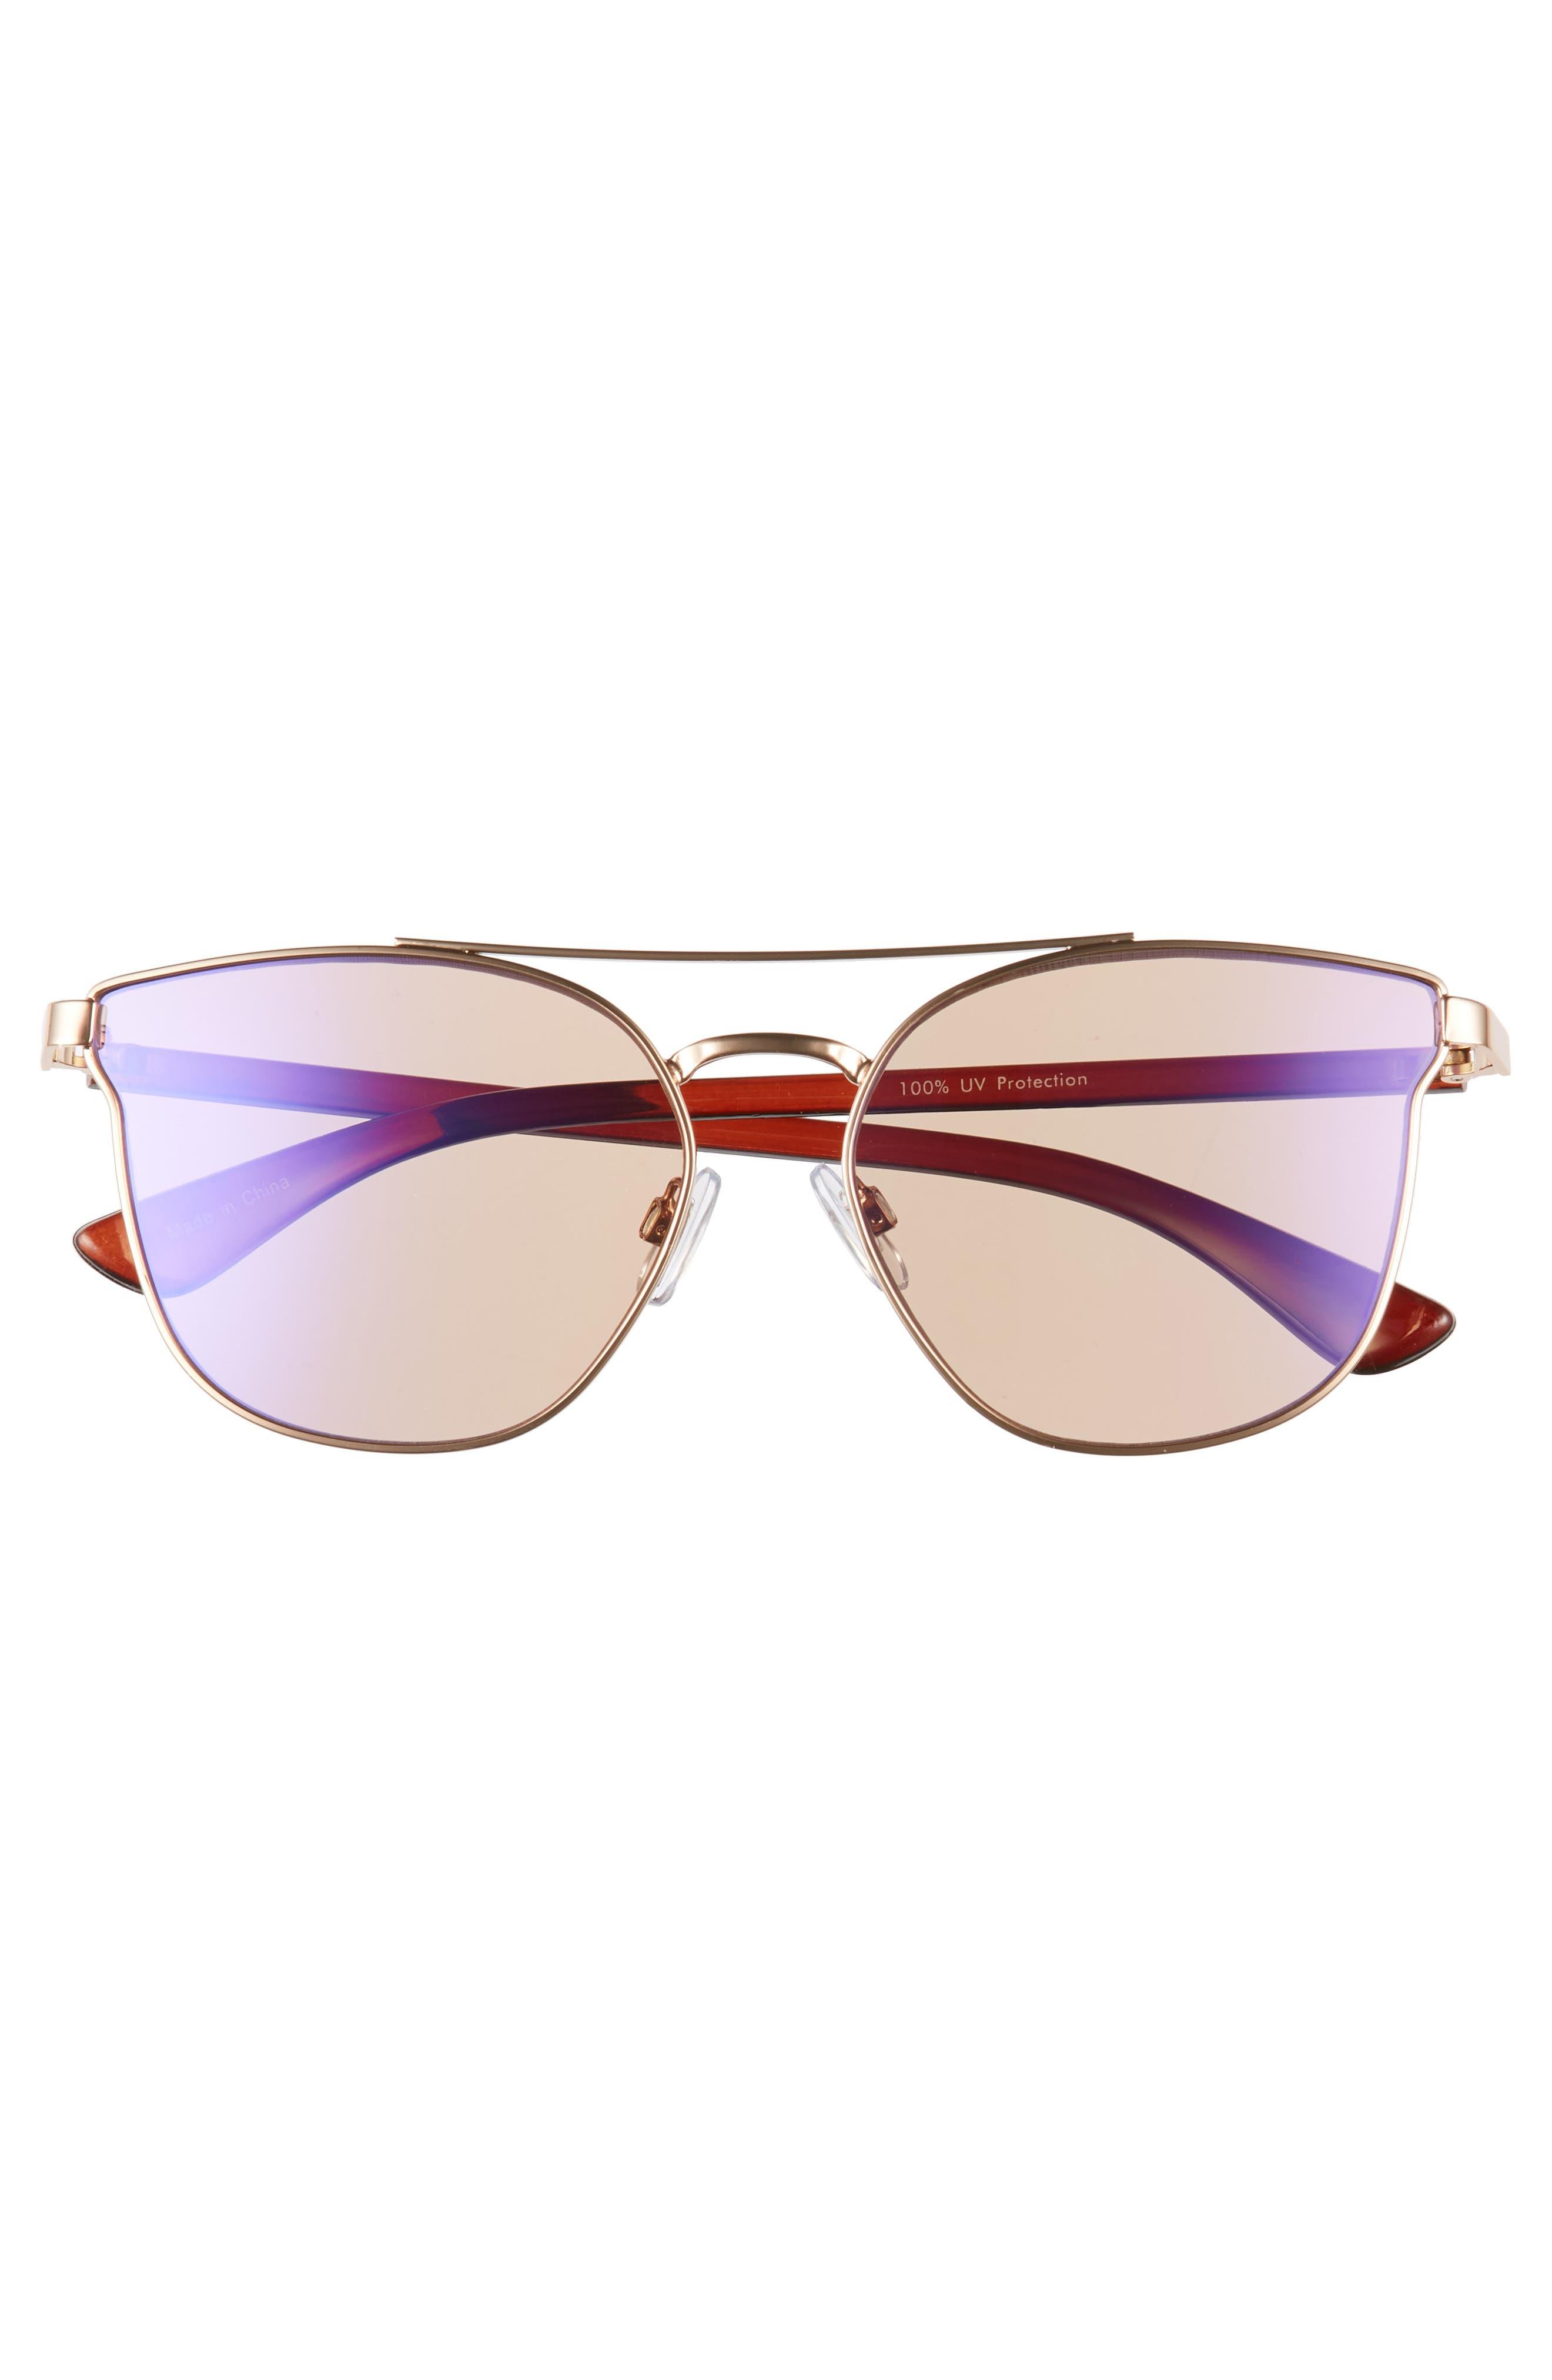 56mm Flat Mirrored Aviator Sunglasses,                             Alternate thumbnail 3, color,                             BRONZE/ BROWN